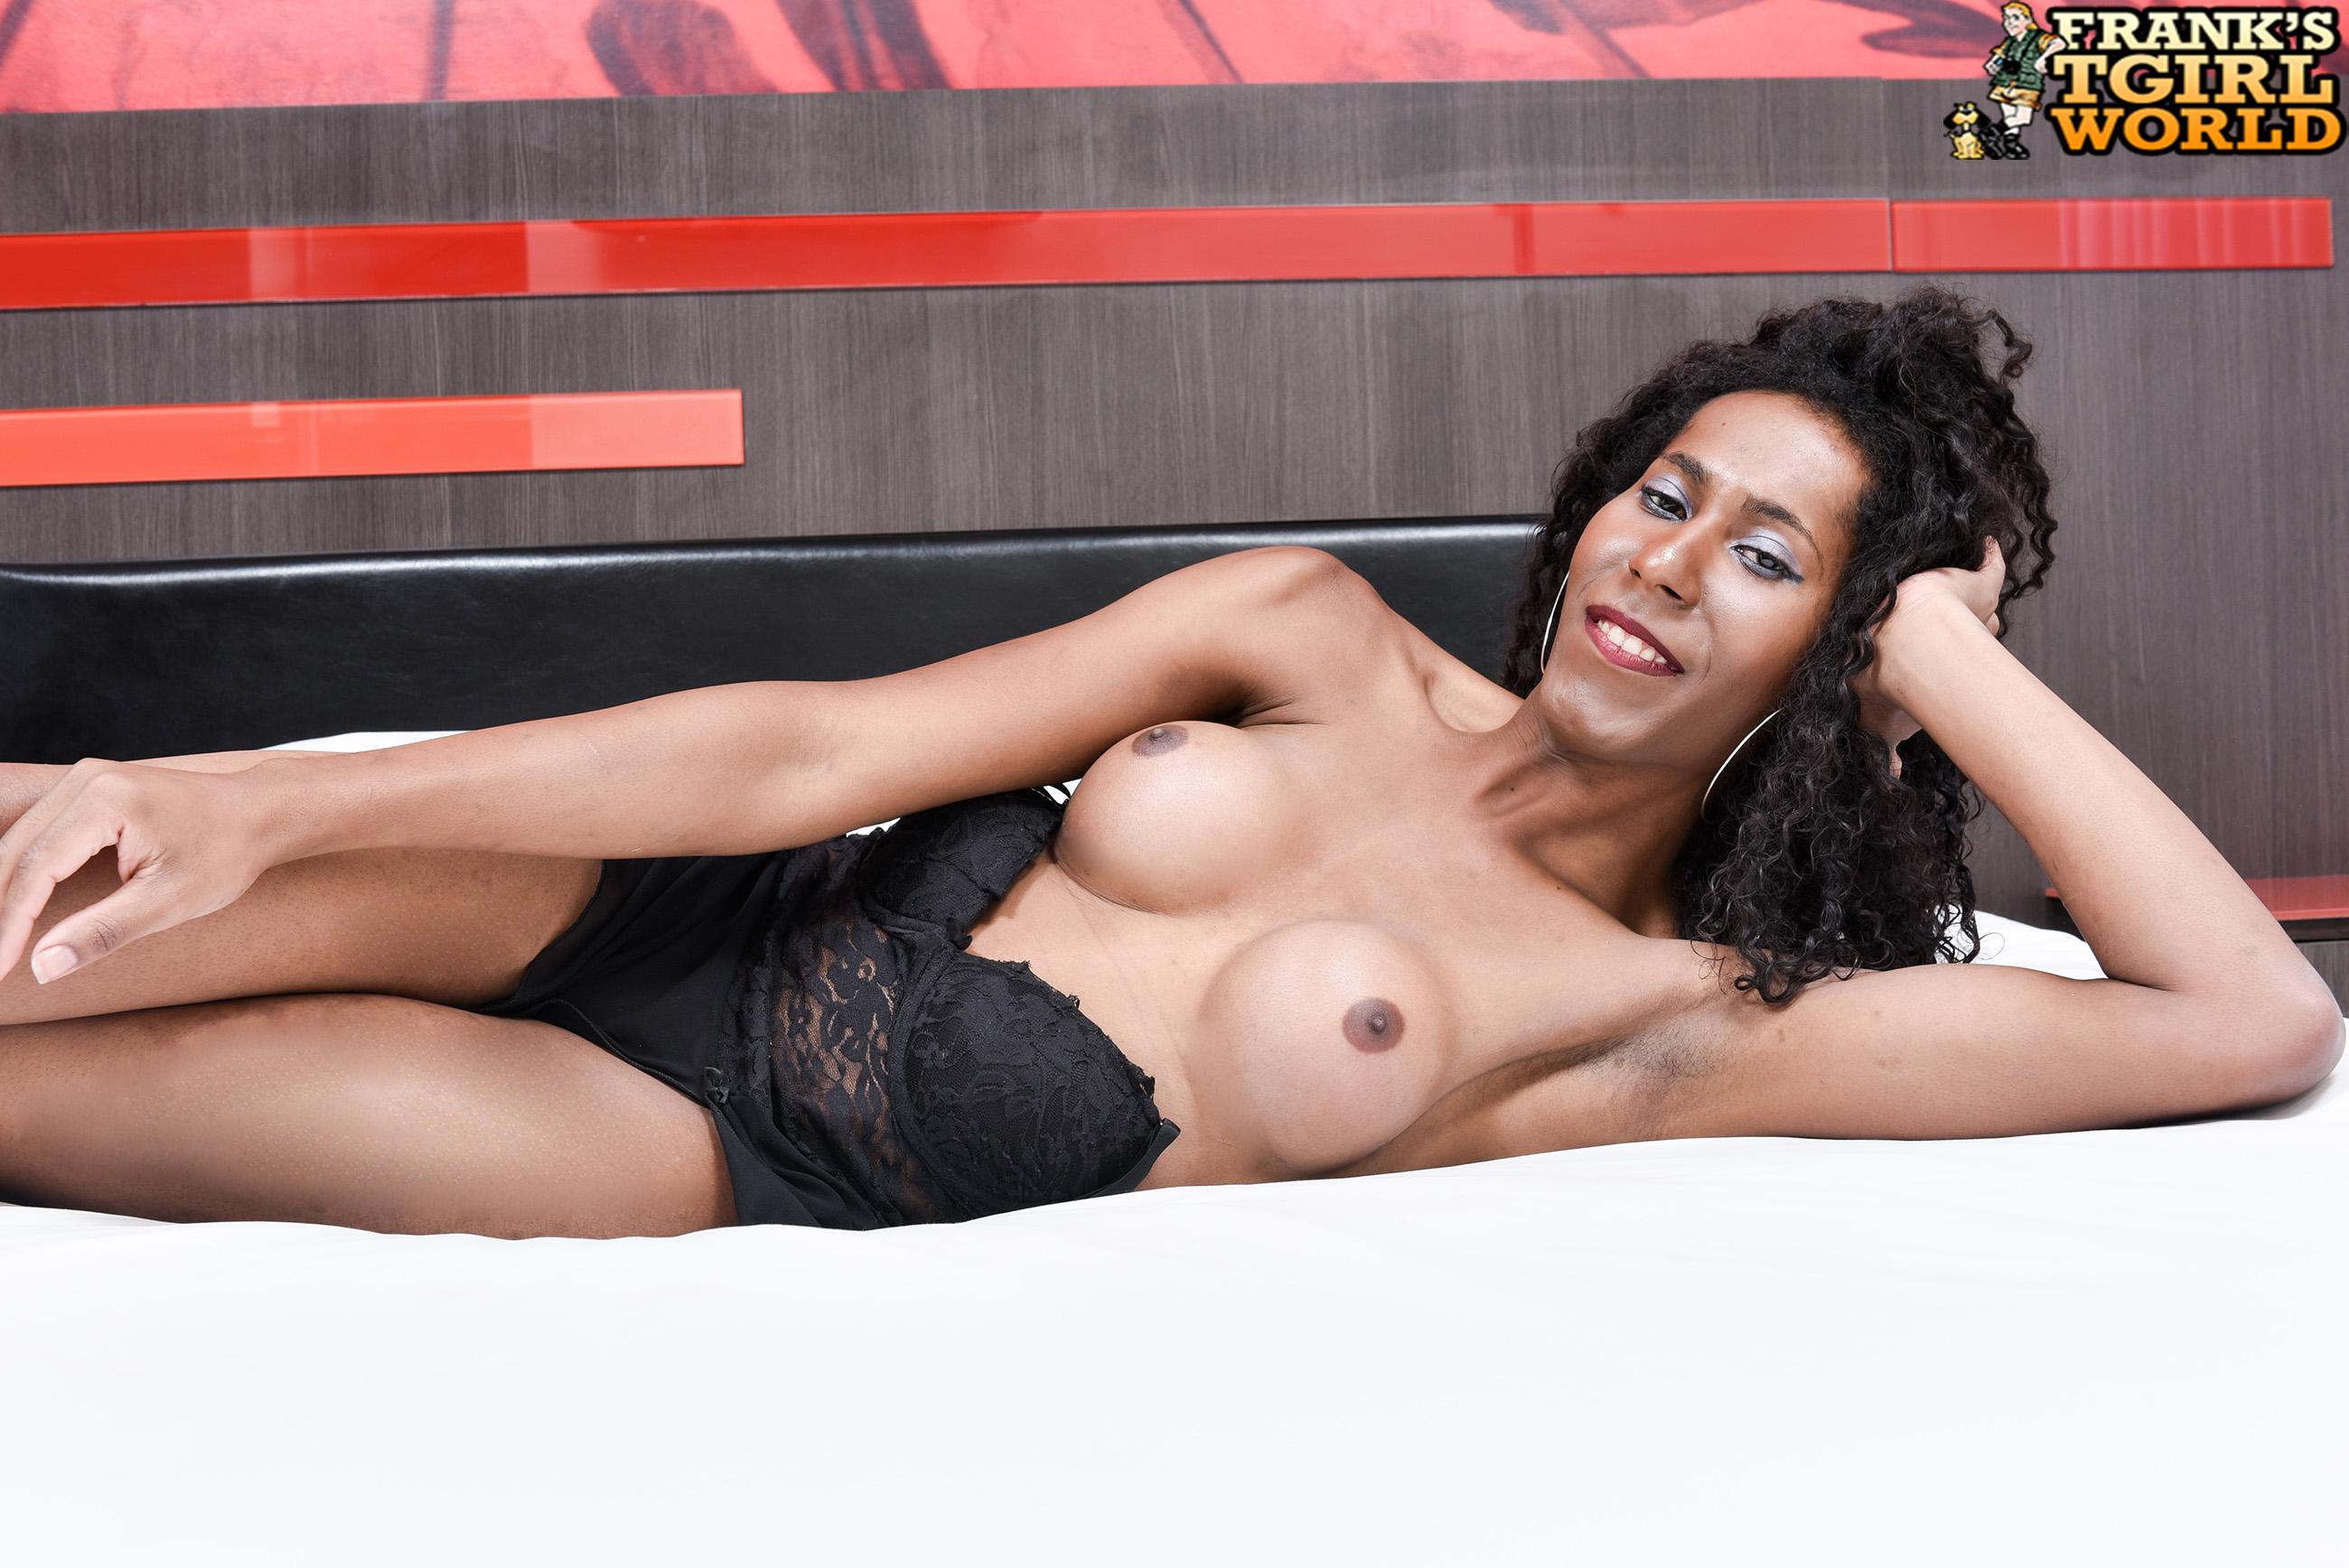 Anahi Sex dulce anahi in tgirlsxxx mexican beauty dulce anahi! may 03